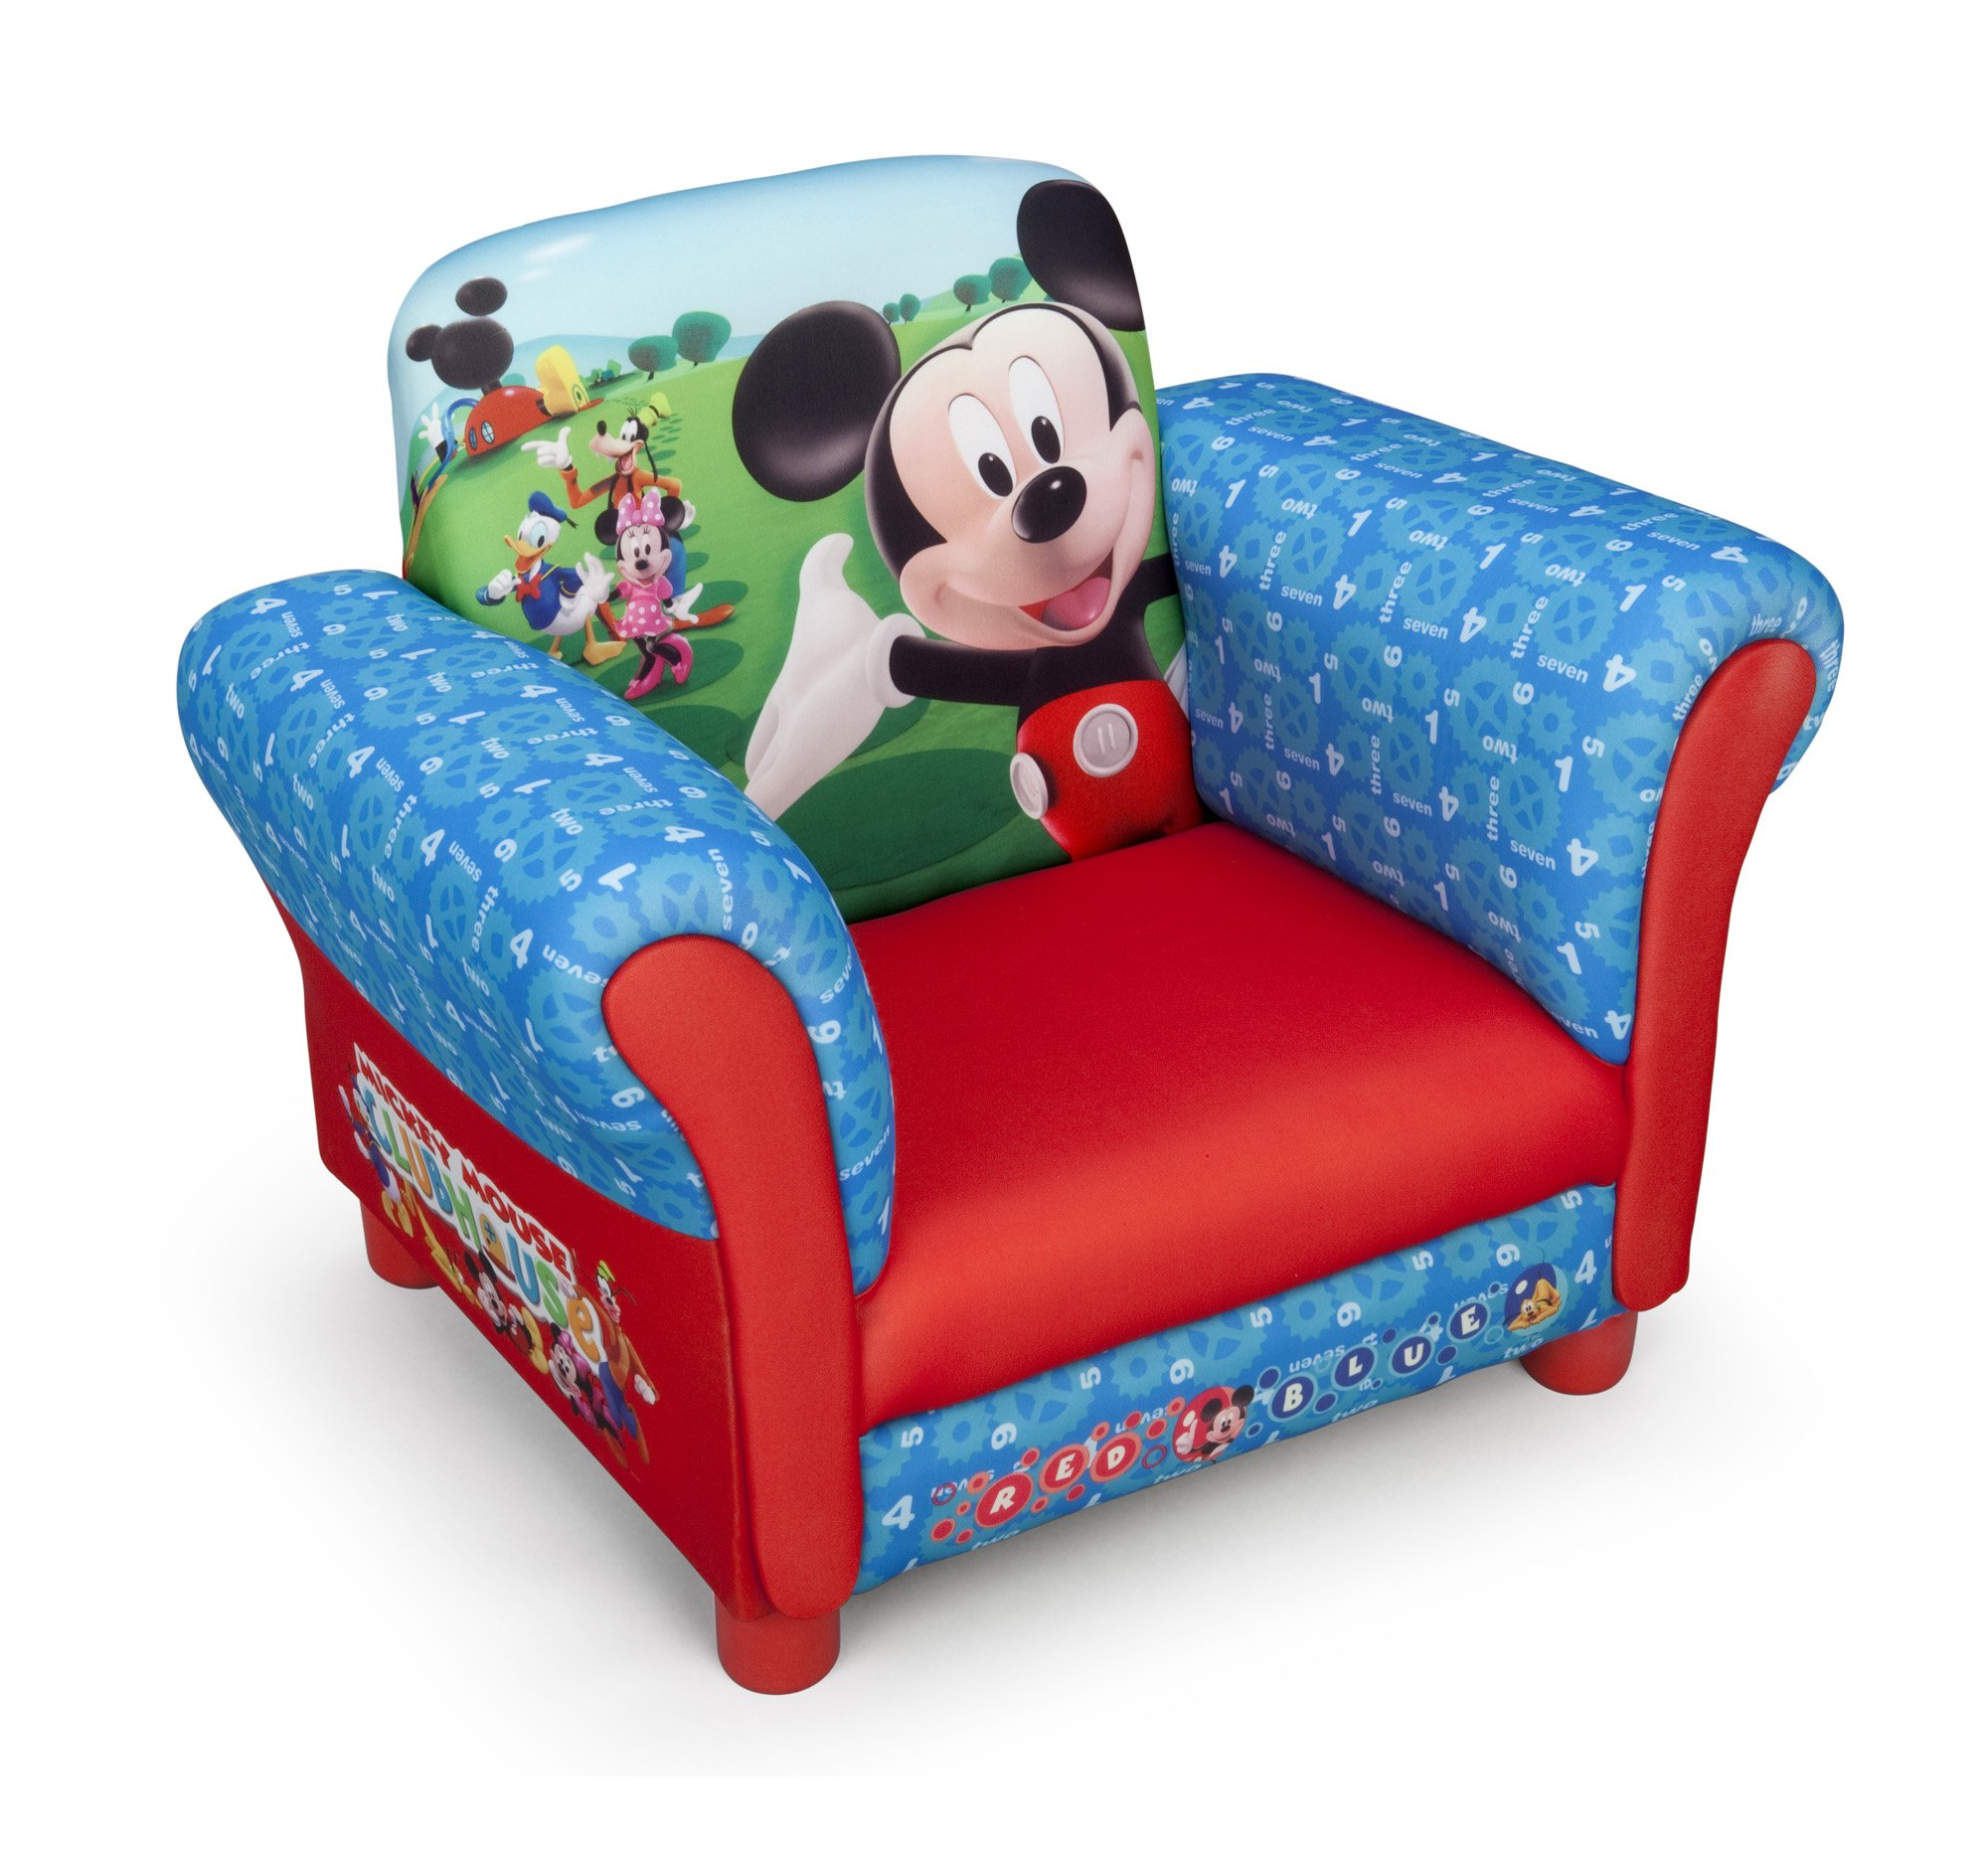 Disney - Poltrona imbottita di Mickey Mouse product image